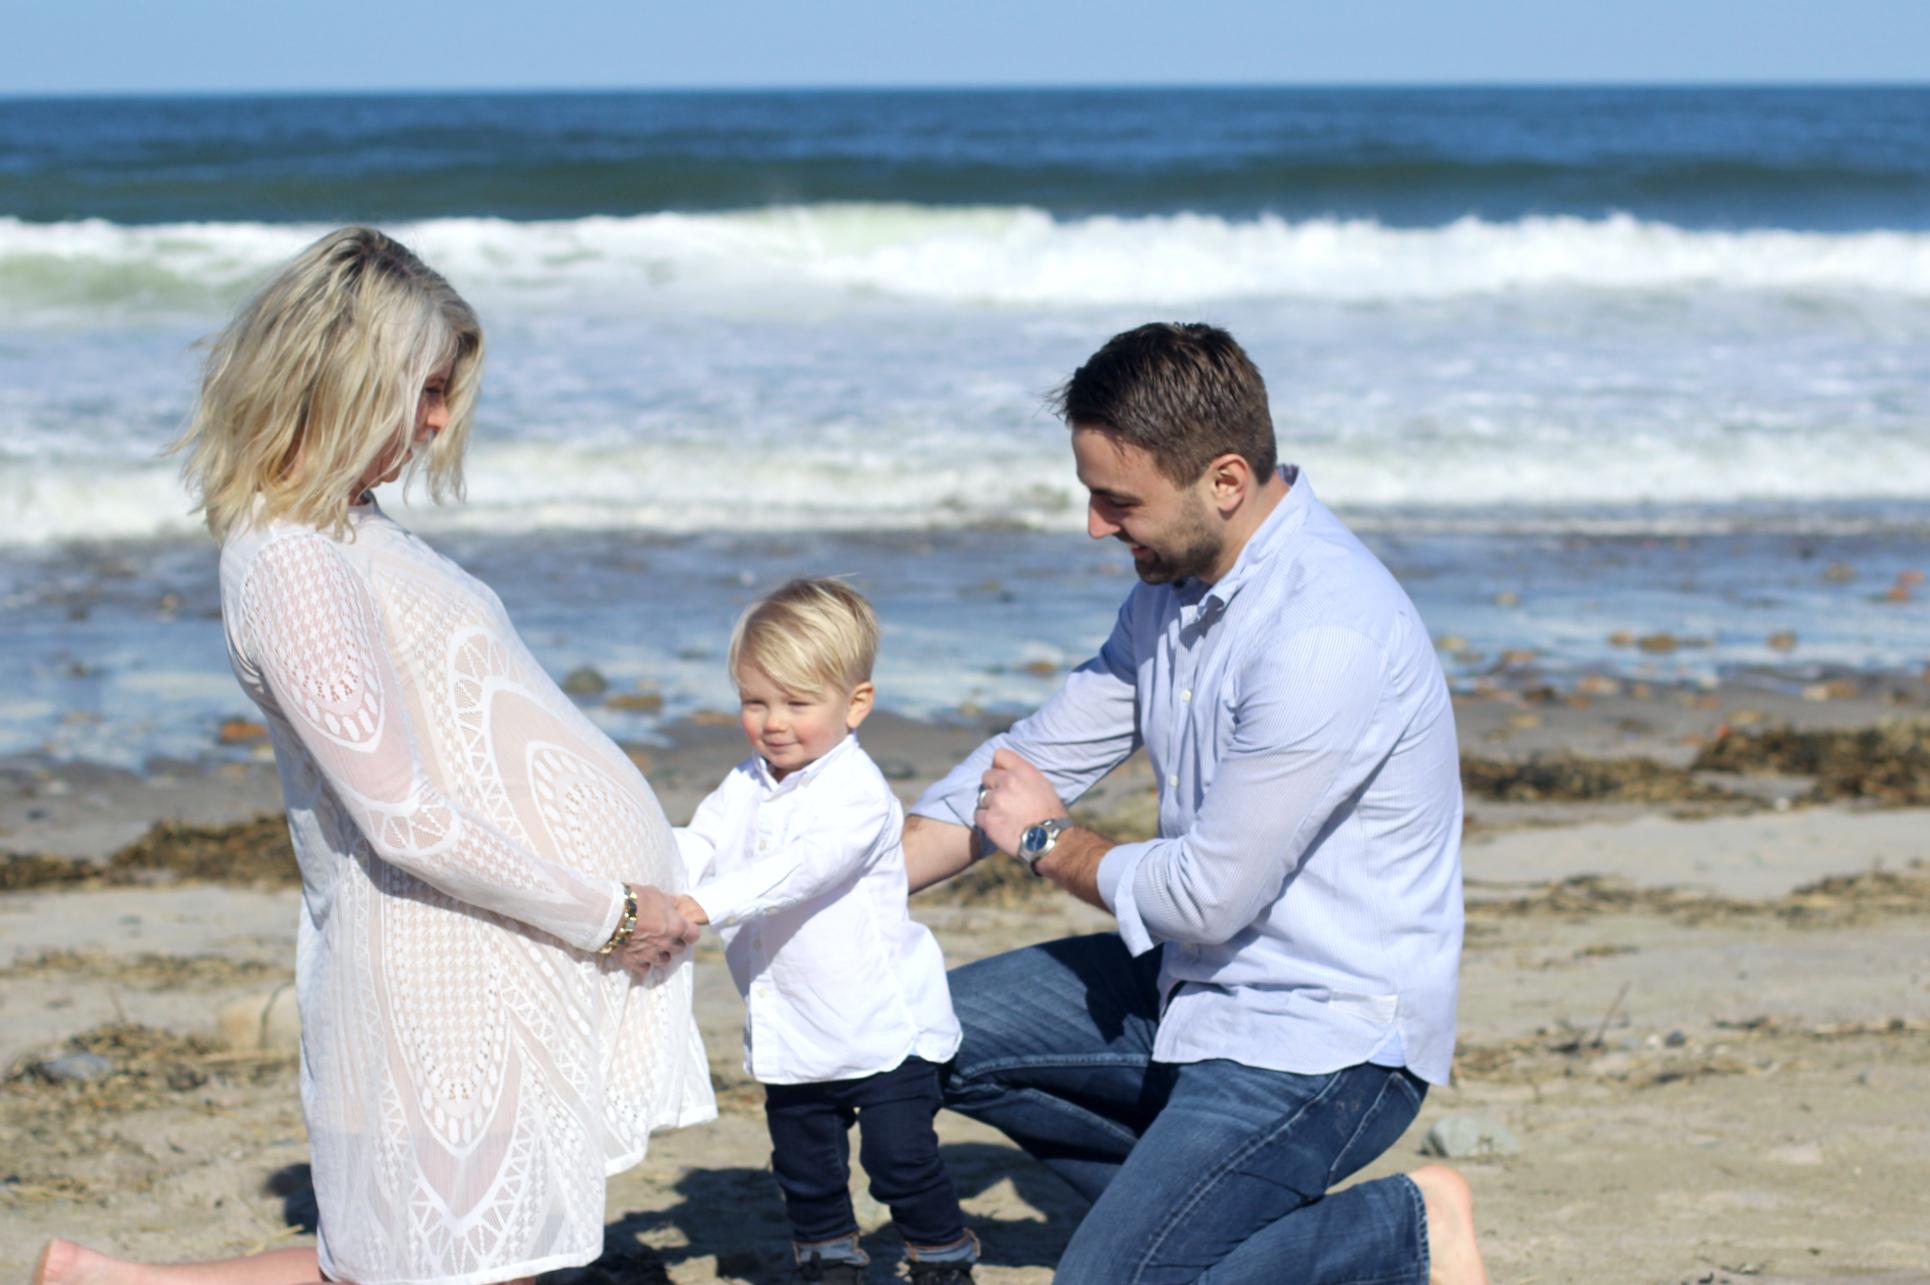 Beach maternity mom style shoot lifestyle blog maternity fashion